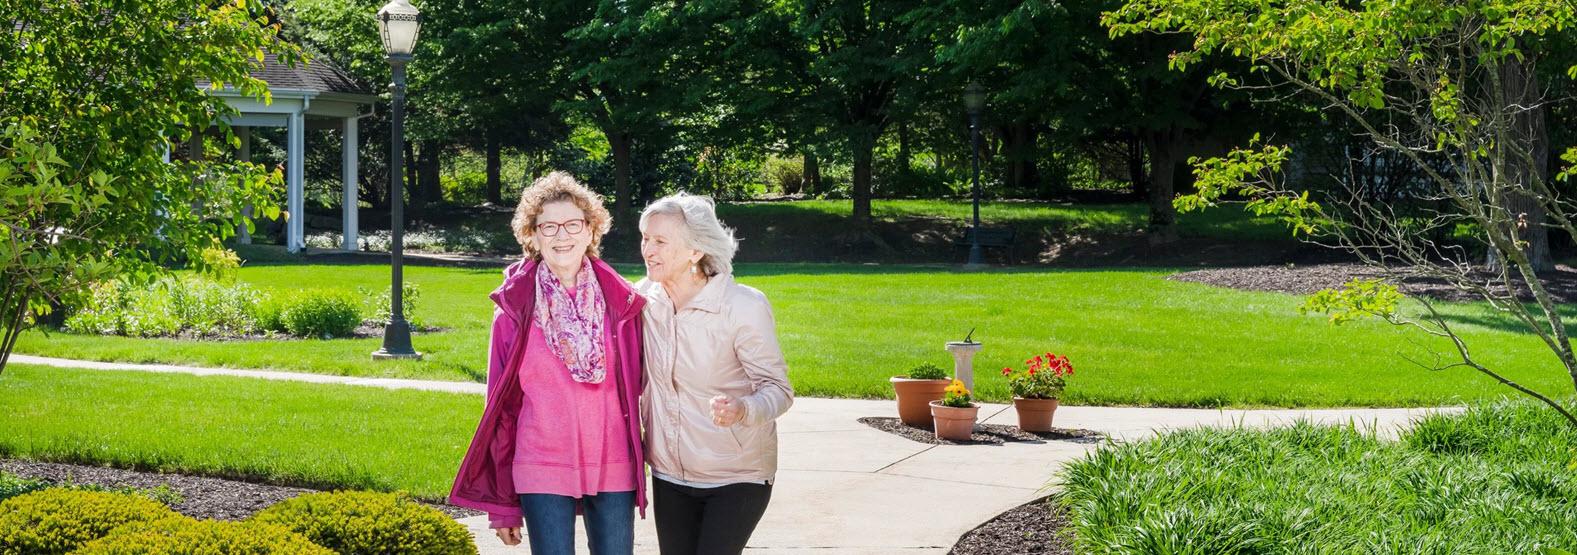 retirement communities lewisburg pa